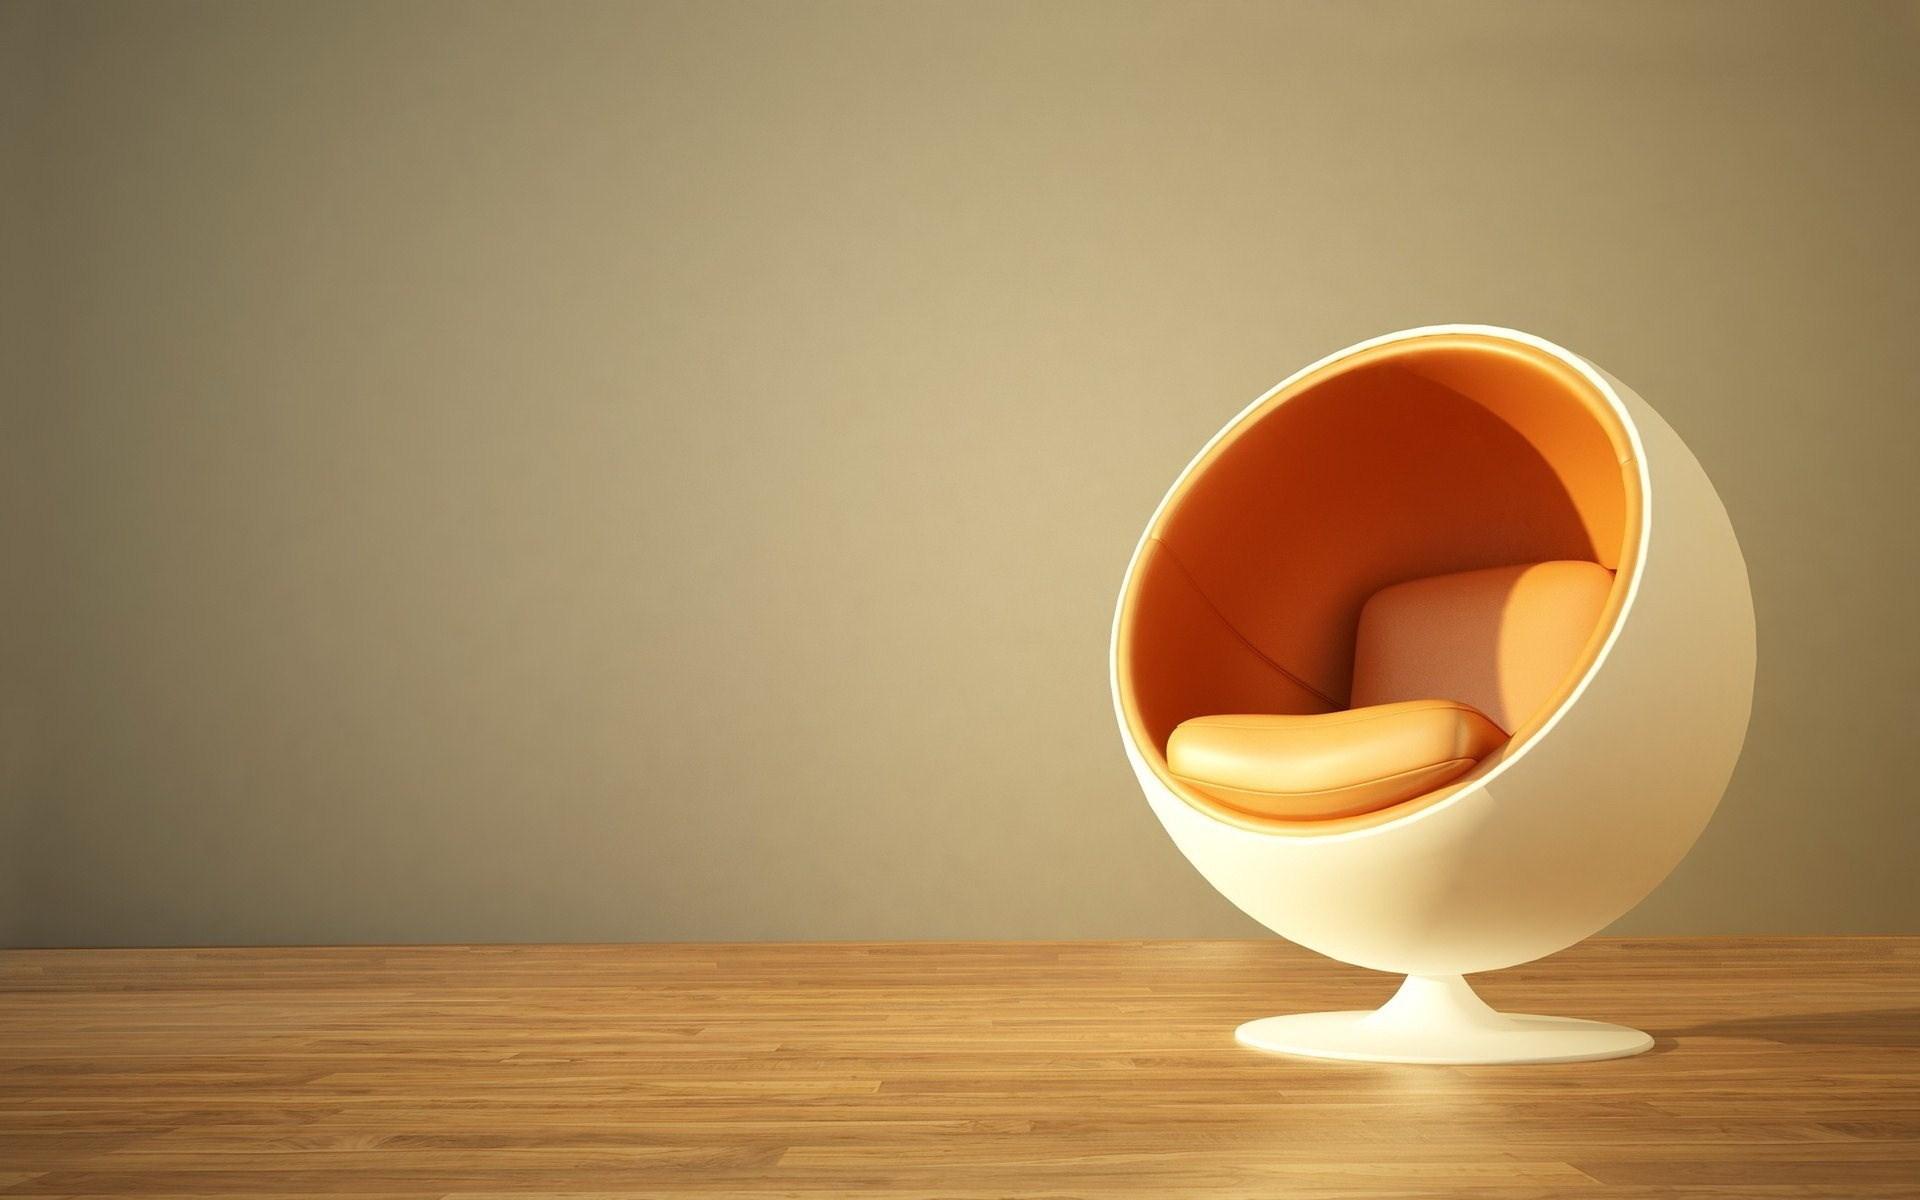 chair-interior-design-style-wooden-floor-hd-wallpaper-background-uhd-2k-4k-5k-2015-2016-tablet-phone-mobile-pc-computer-Other-Hosting.jpg